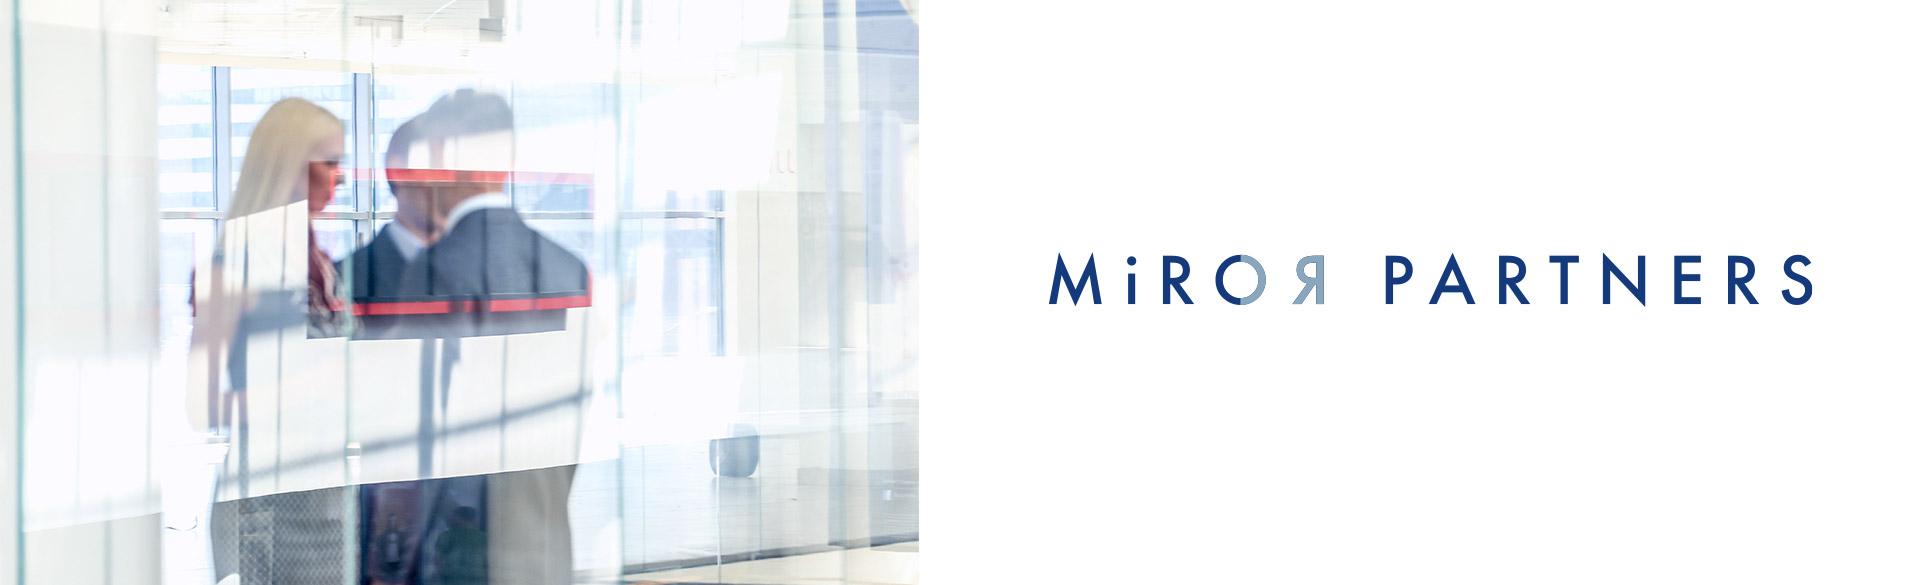 MiROR_Partners_Case-Study_Banner-2